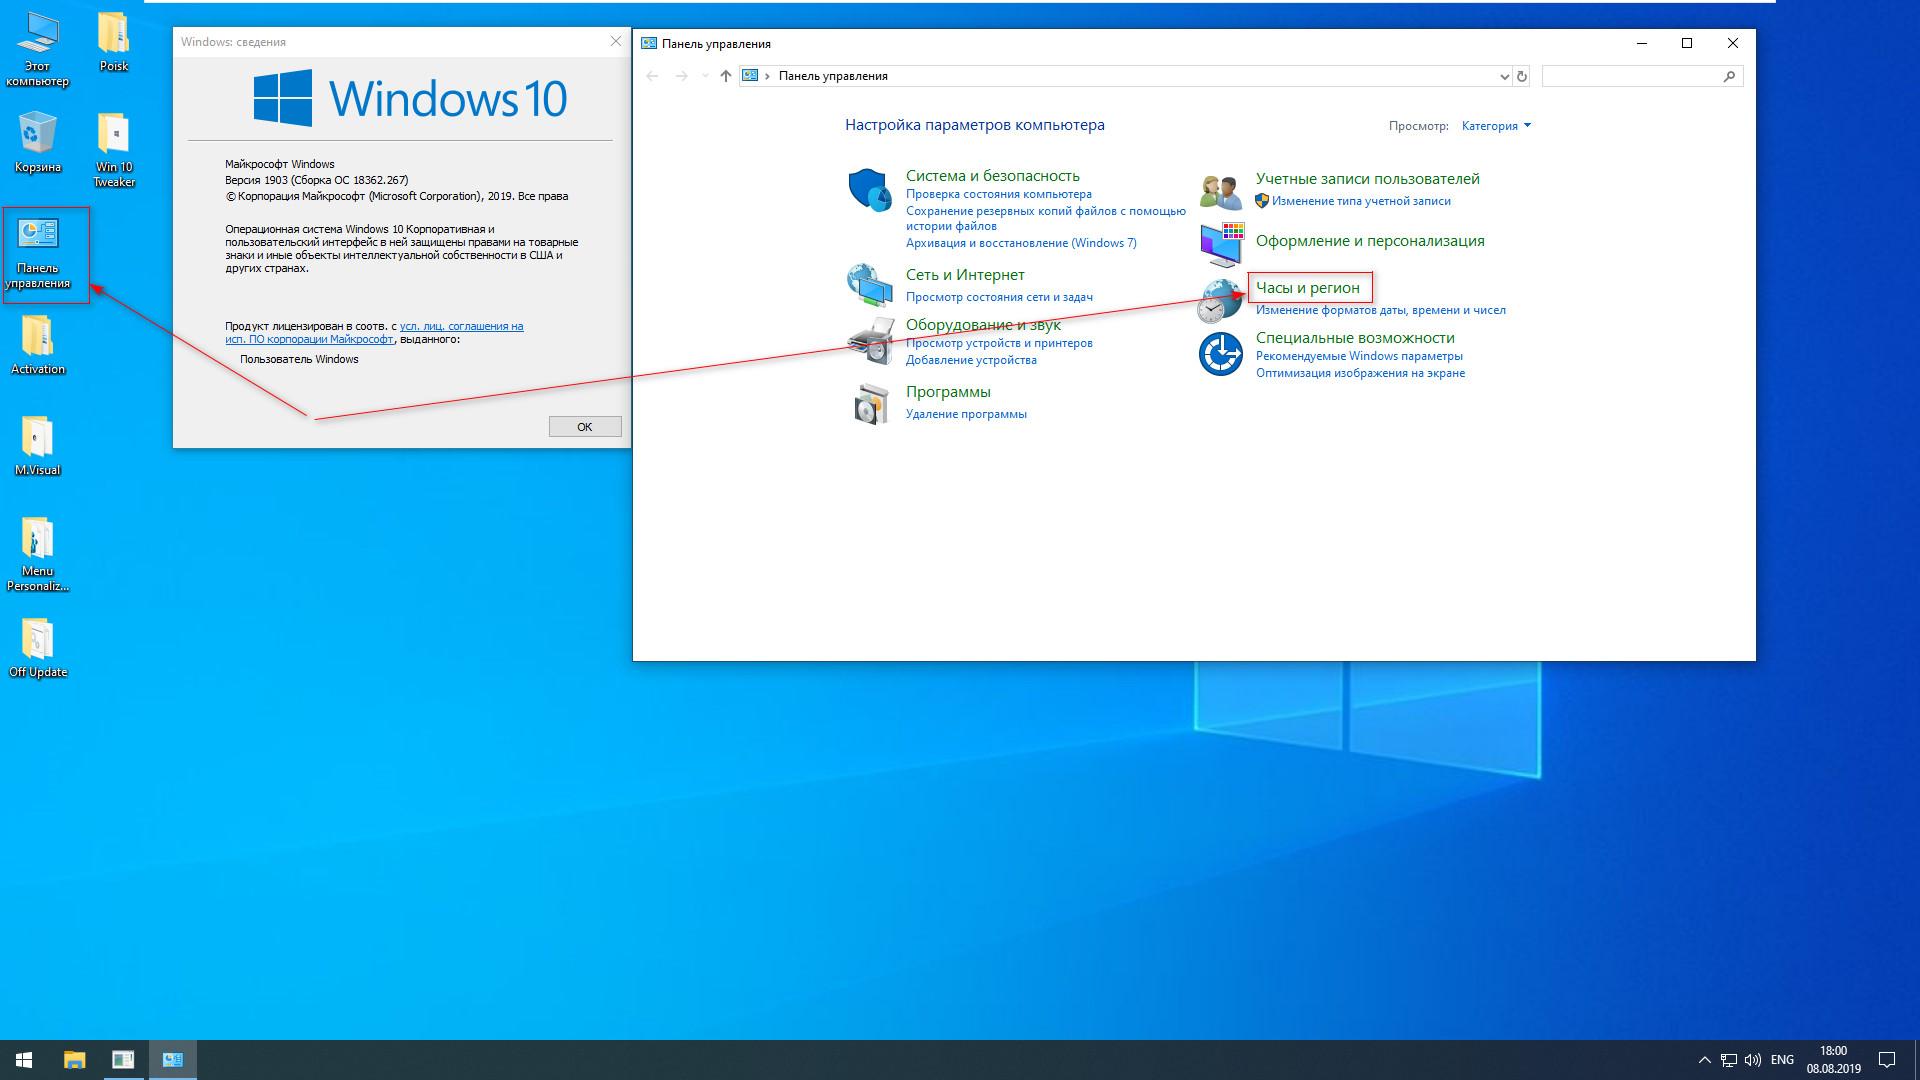 Windows 10 Enterprise x64 lite 1903 build 18362.267 by Zosma.iso - 러시아어 한글화 시도 - 그래서 그냥 원본대로 설치 후에 한글화 시도 2019-08-09_000054.jpg